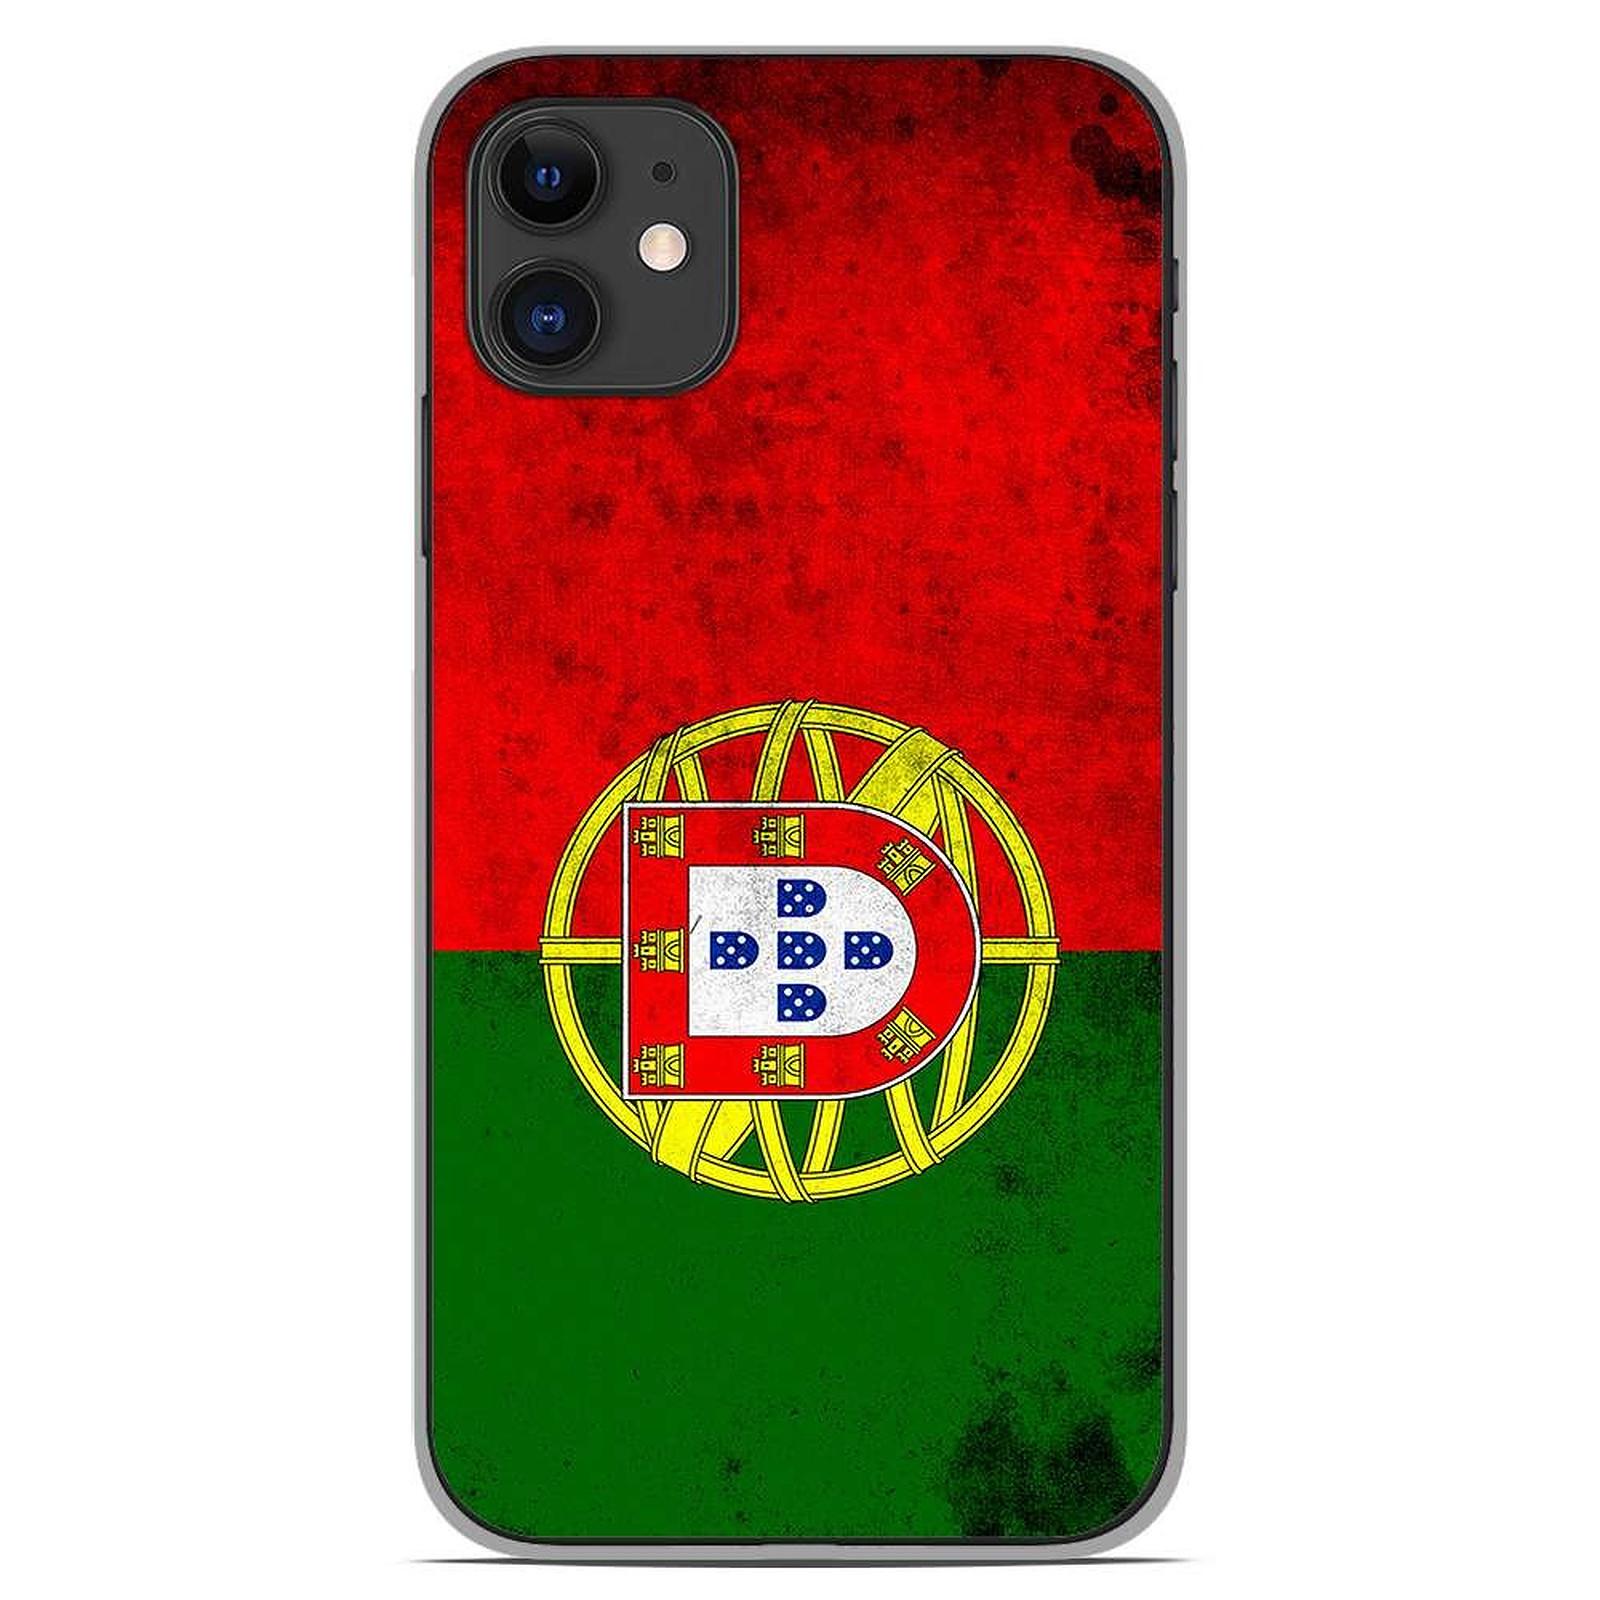 1001 Coques Coque silicone gel Apple iPhone 11 motif Drapeau Portugal